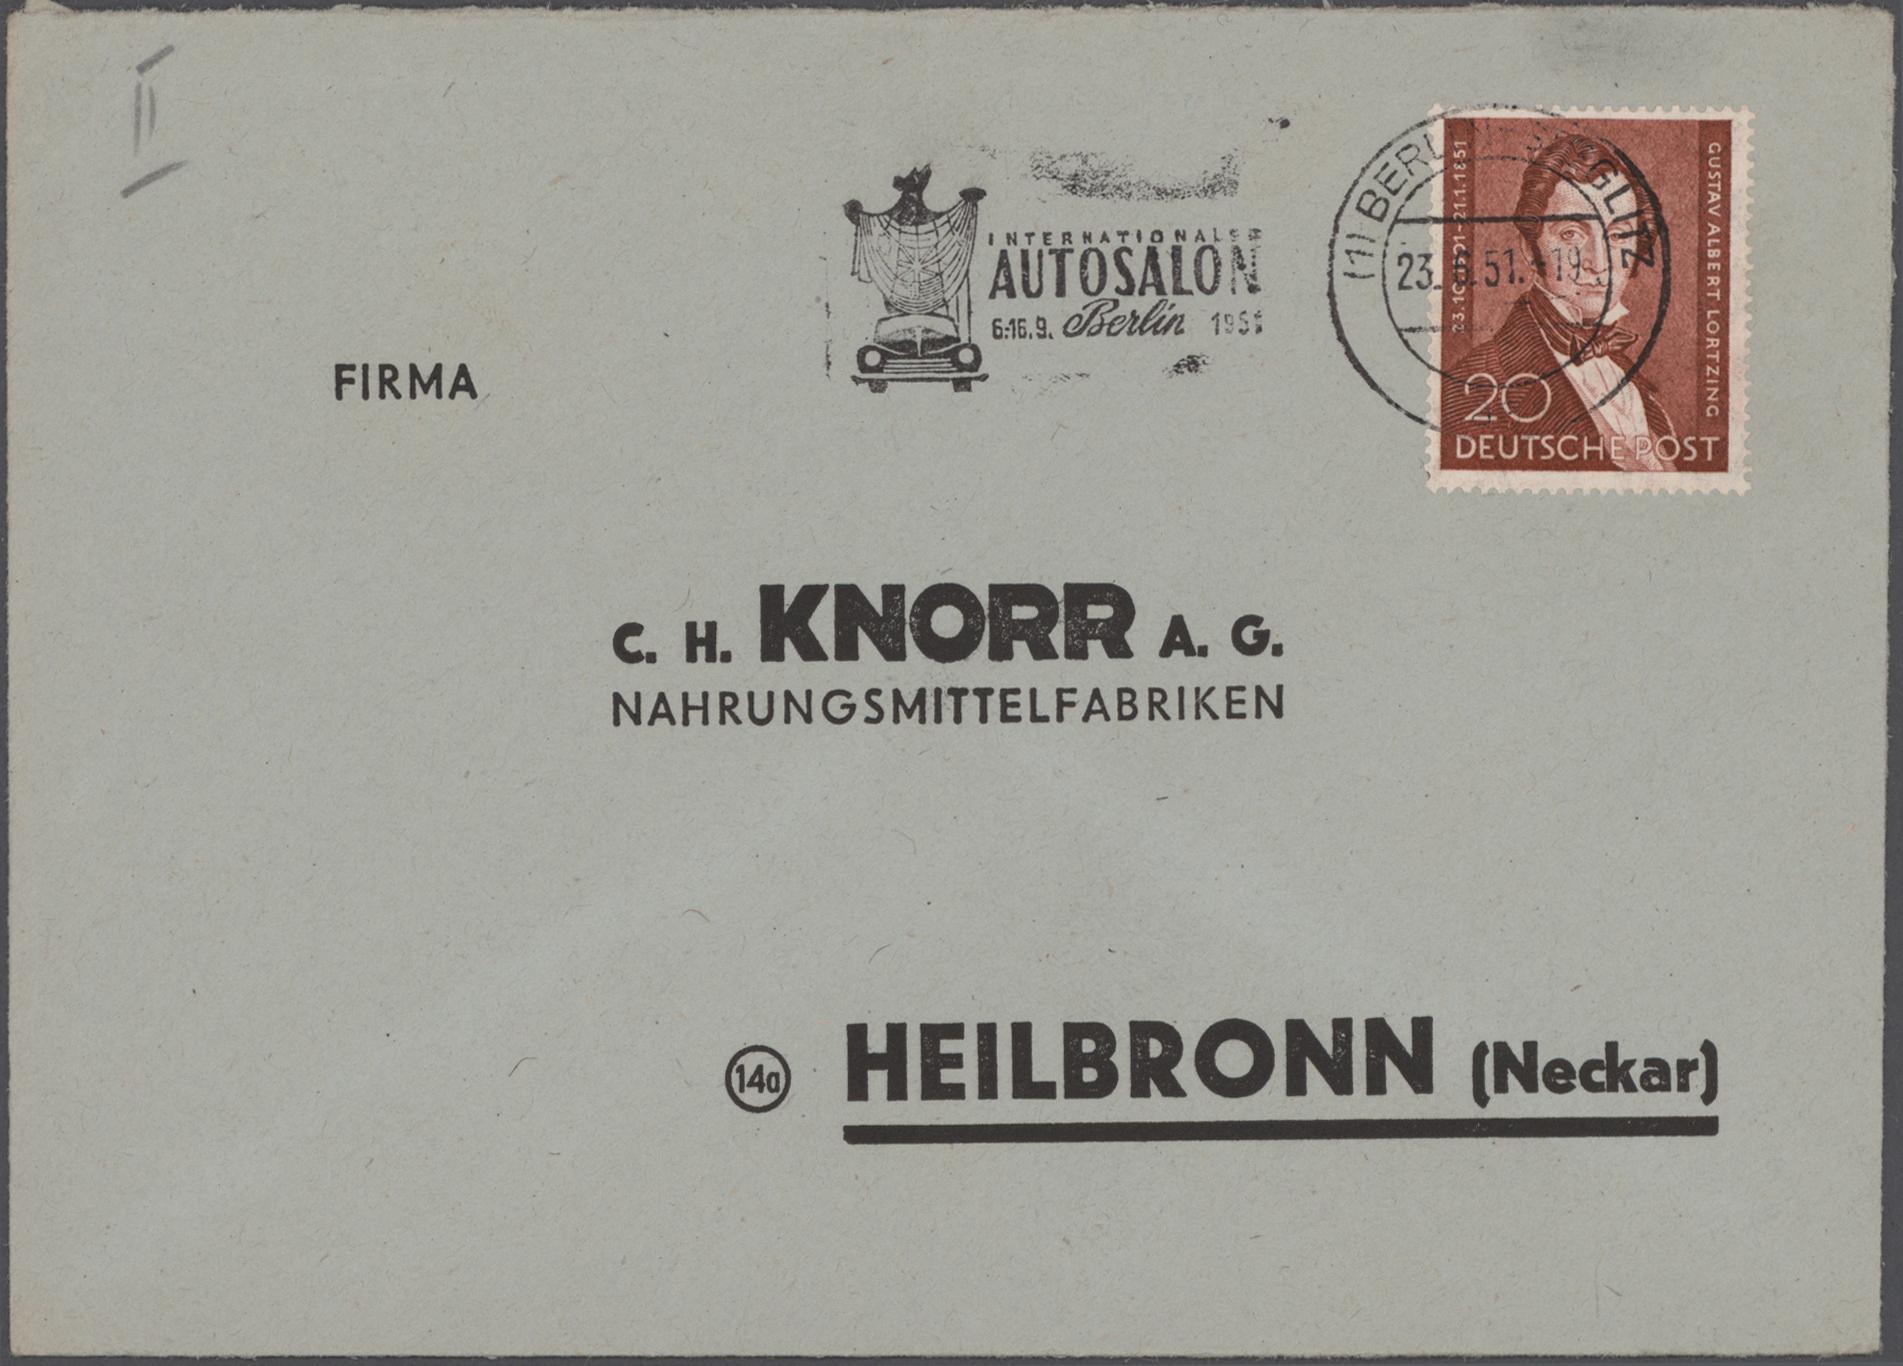 Lot 26293 - nachlässe  -  Auktionshaus Christoph Gärtner GmbH & Co. KG Sale #46 Gollcetions Germany - including the suplement